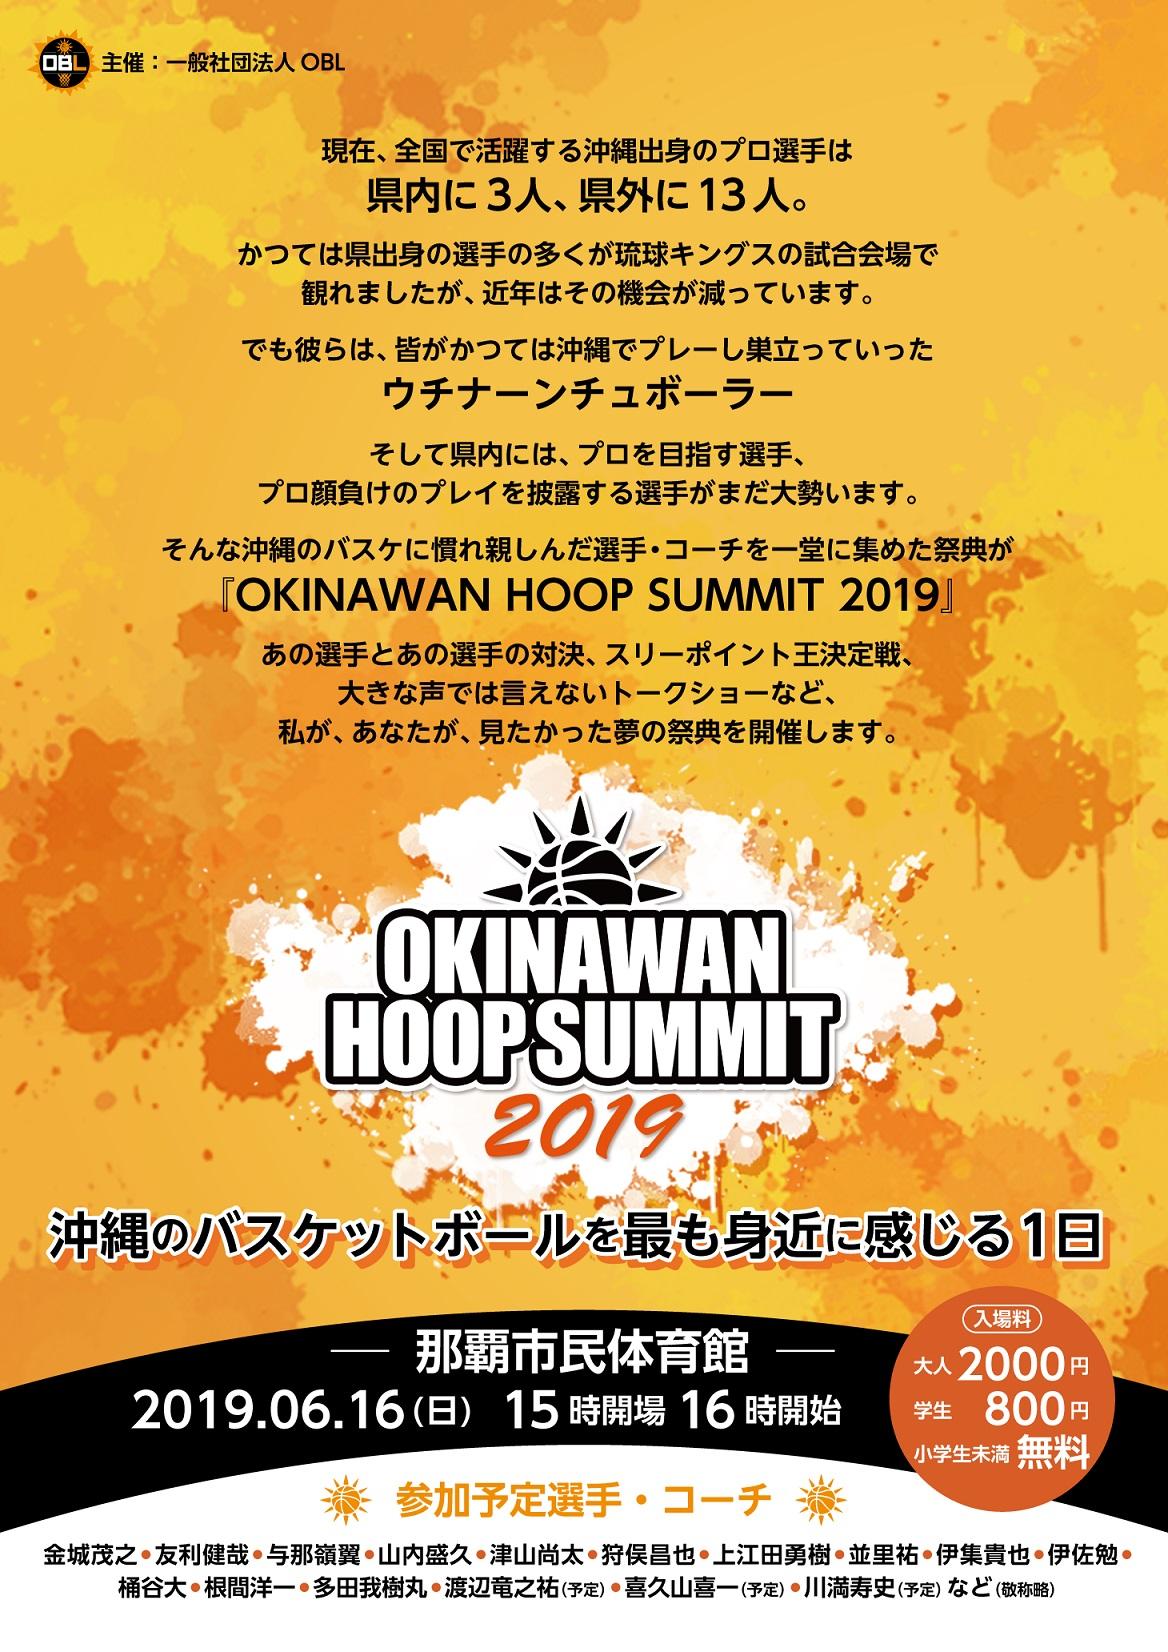 okinawanhoopsummit